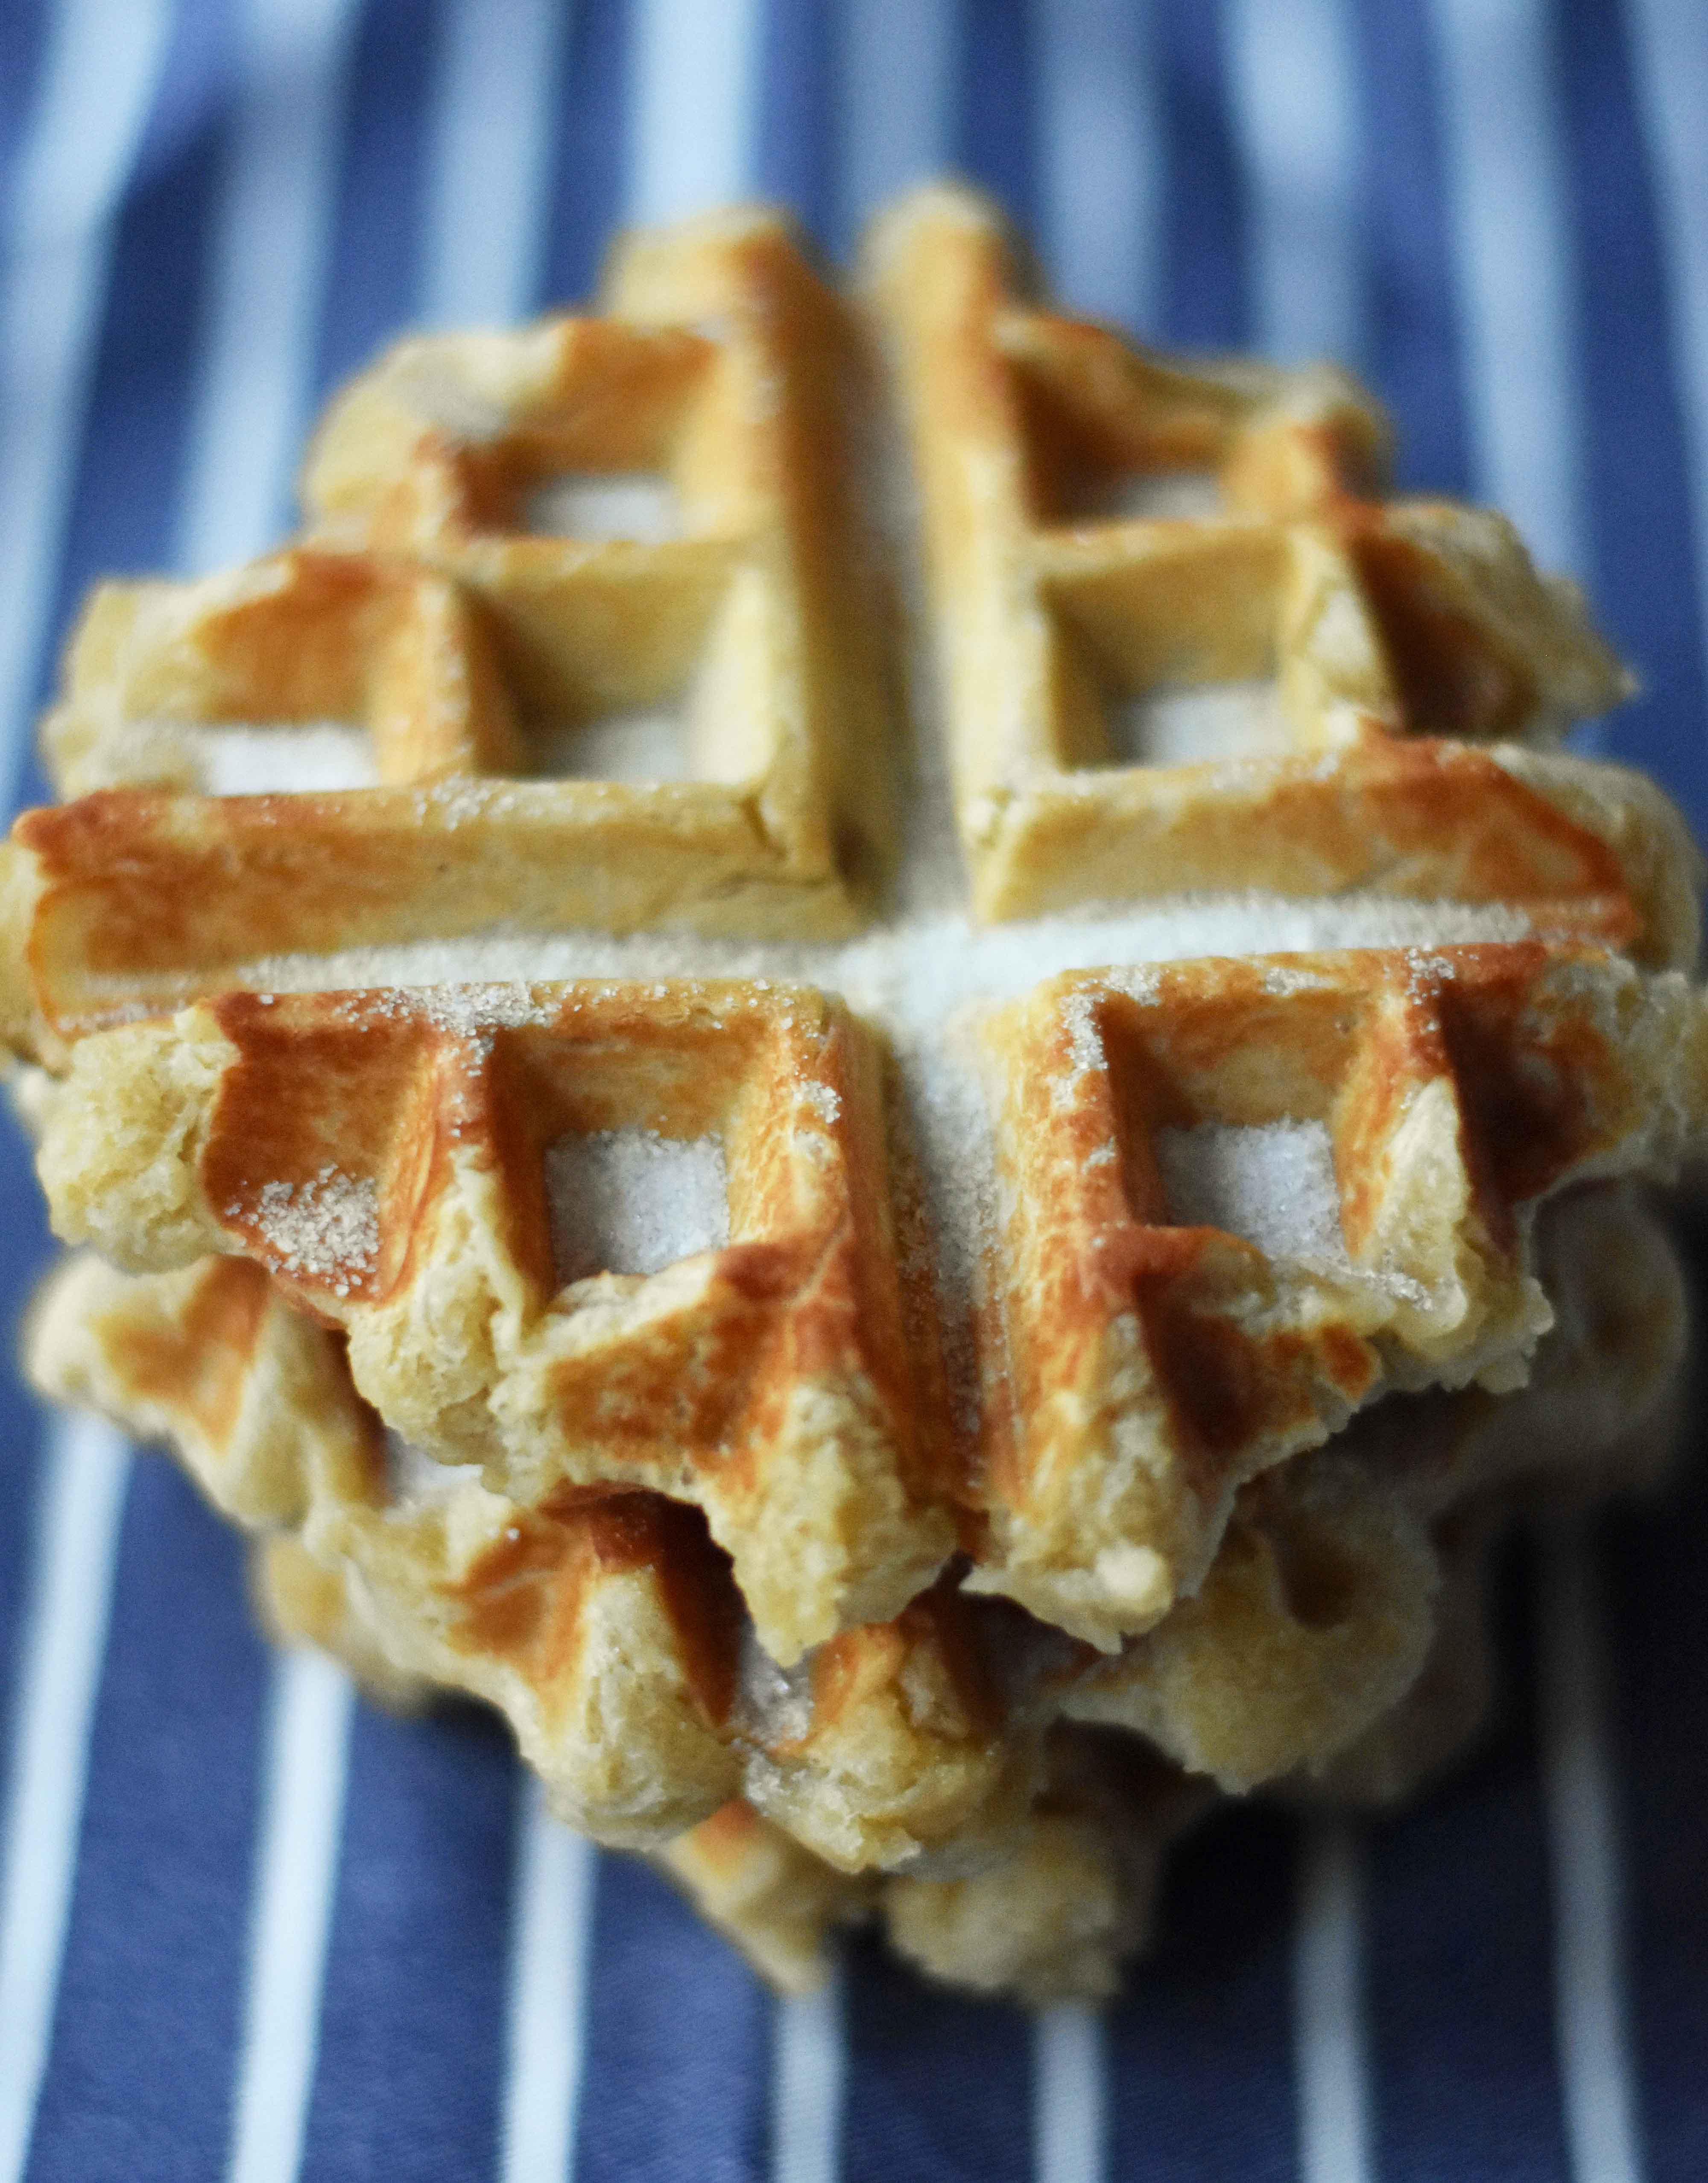 Homemade Best Belgian Liege Waffles. How to make popular belgian liege waffles at home. Waffles n Dingles and Waffle Love Copycat recipe. Perfect belgian liege waffles every single time. Delicious dessert waffles or decadent breakfast waffles. www.modernhoney.com